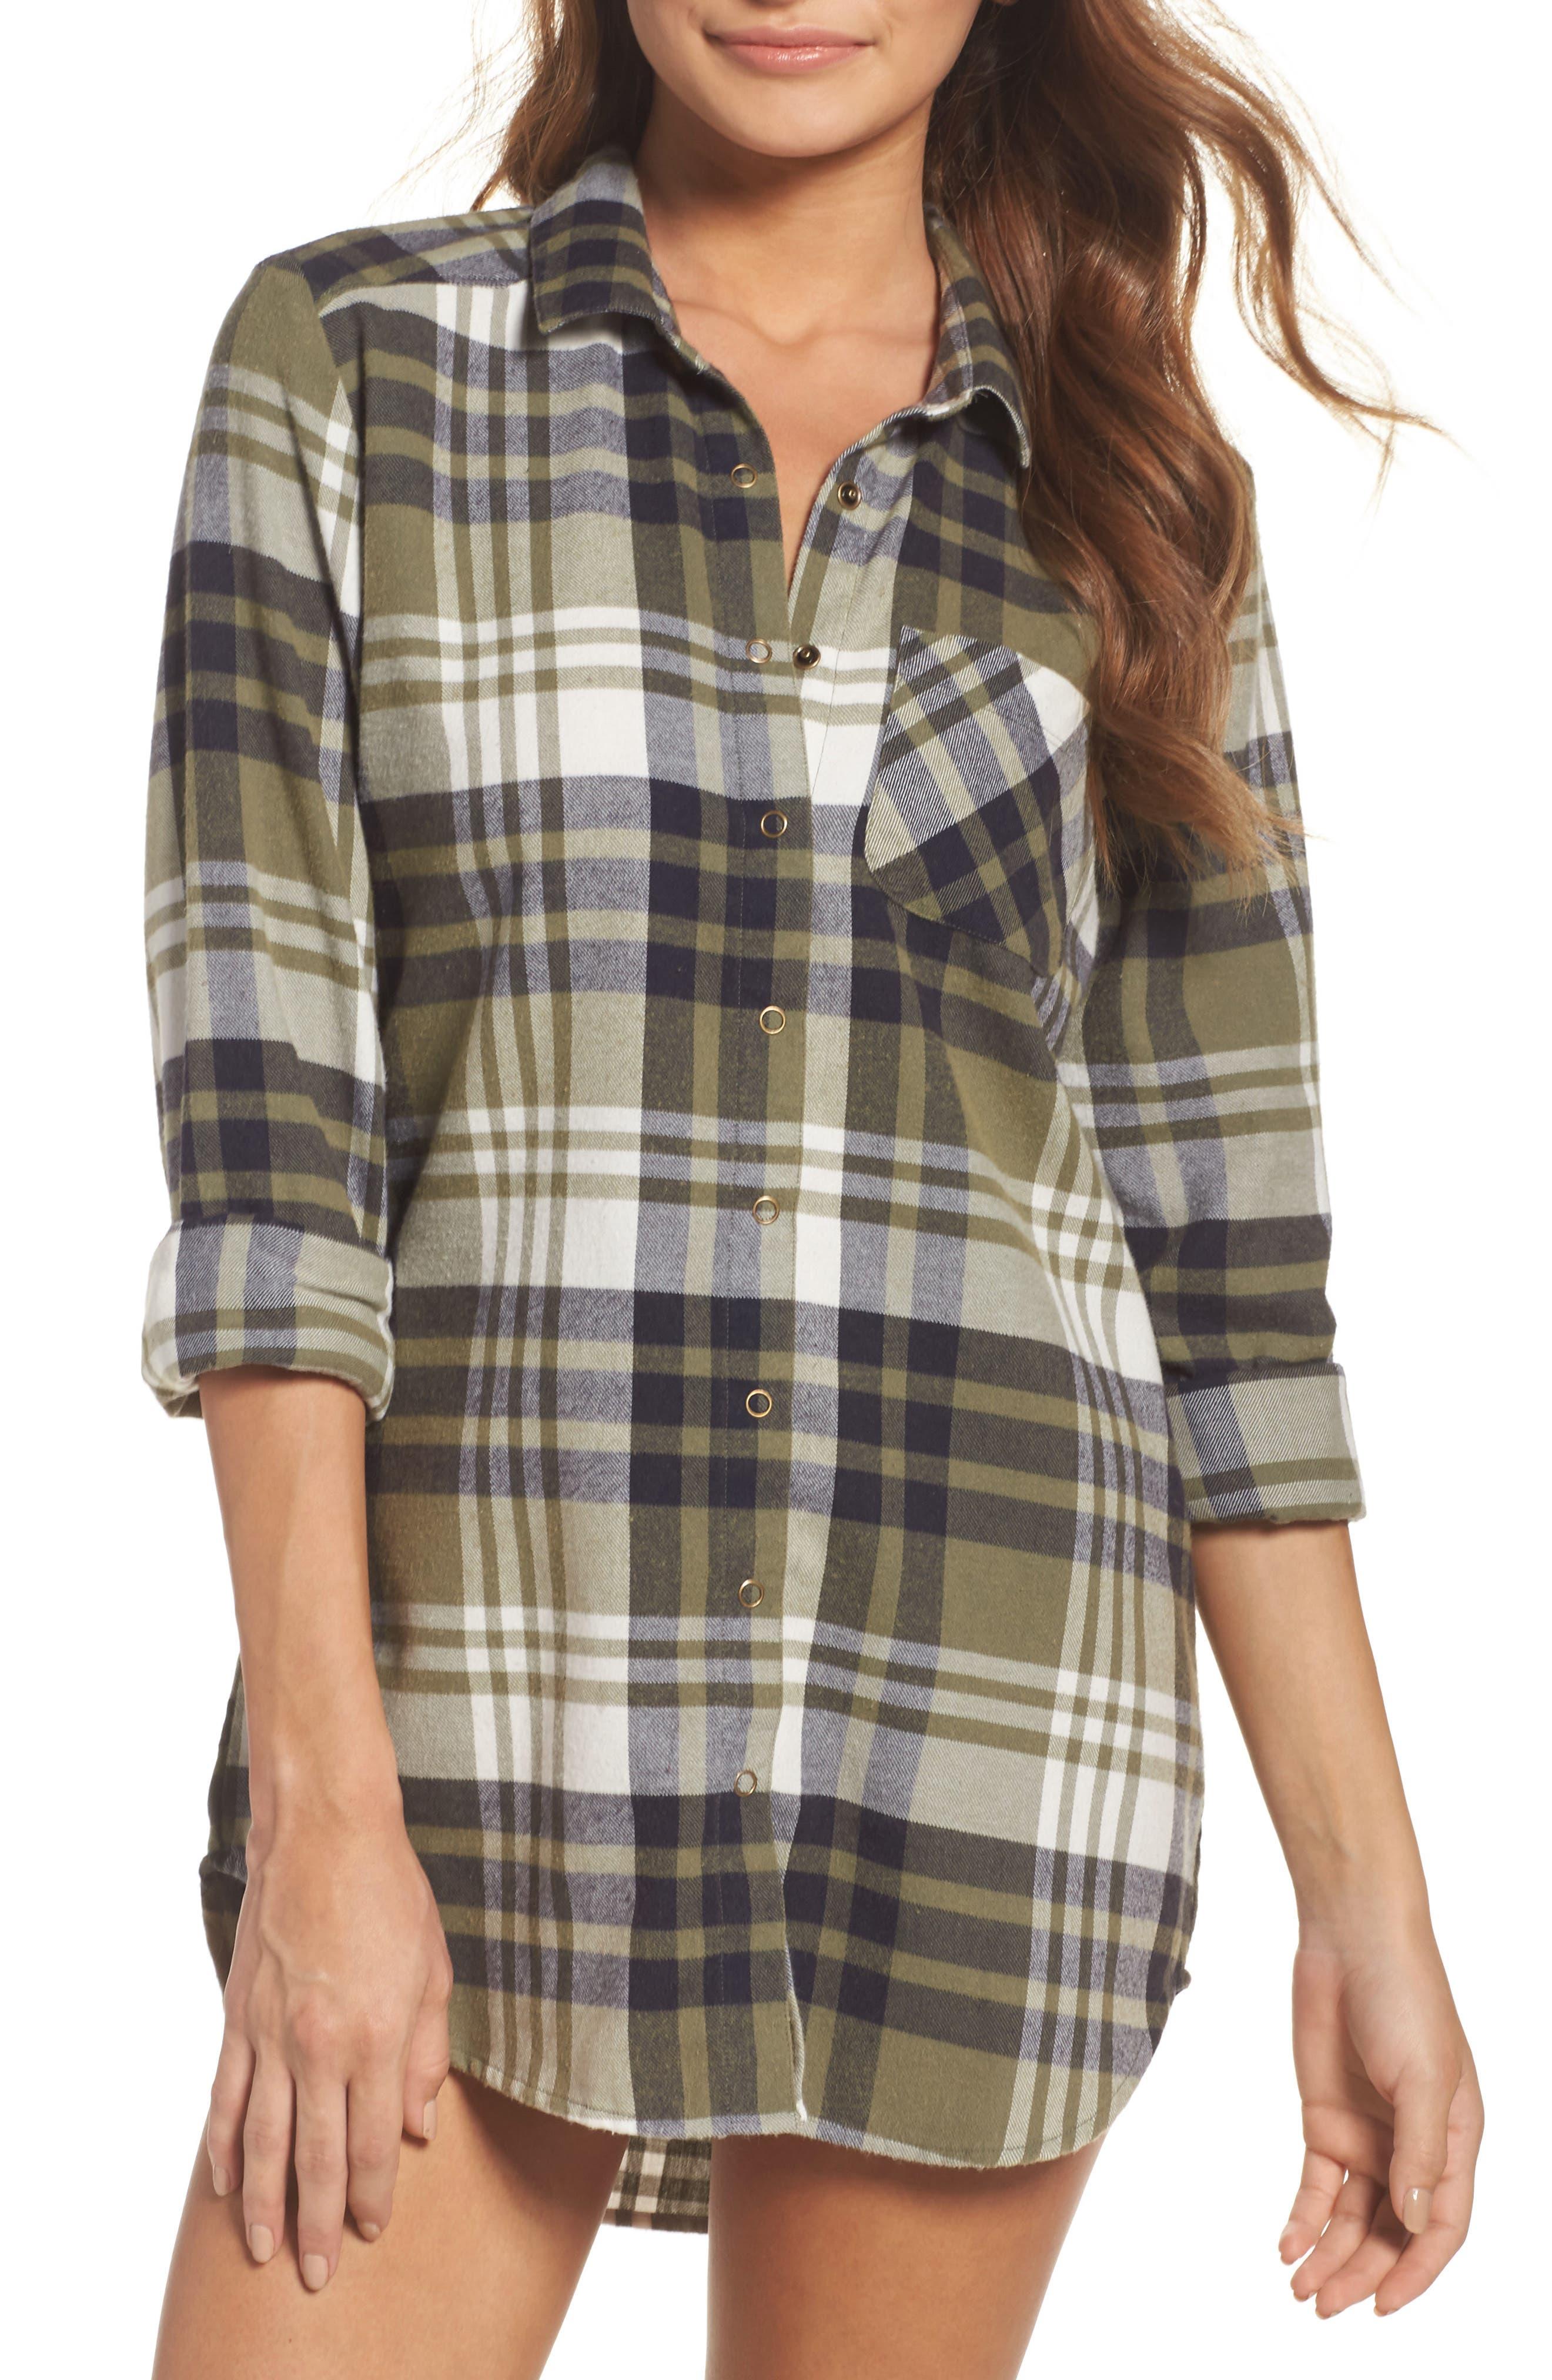 Main Image - Make + Model Plaid Cotton Blend Nightshirt